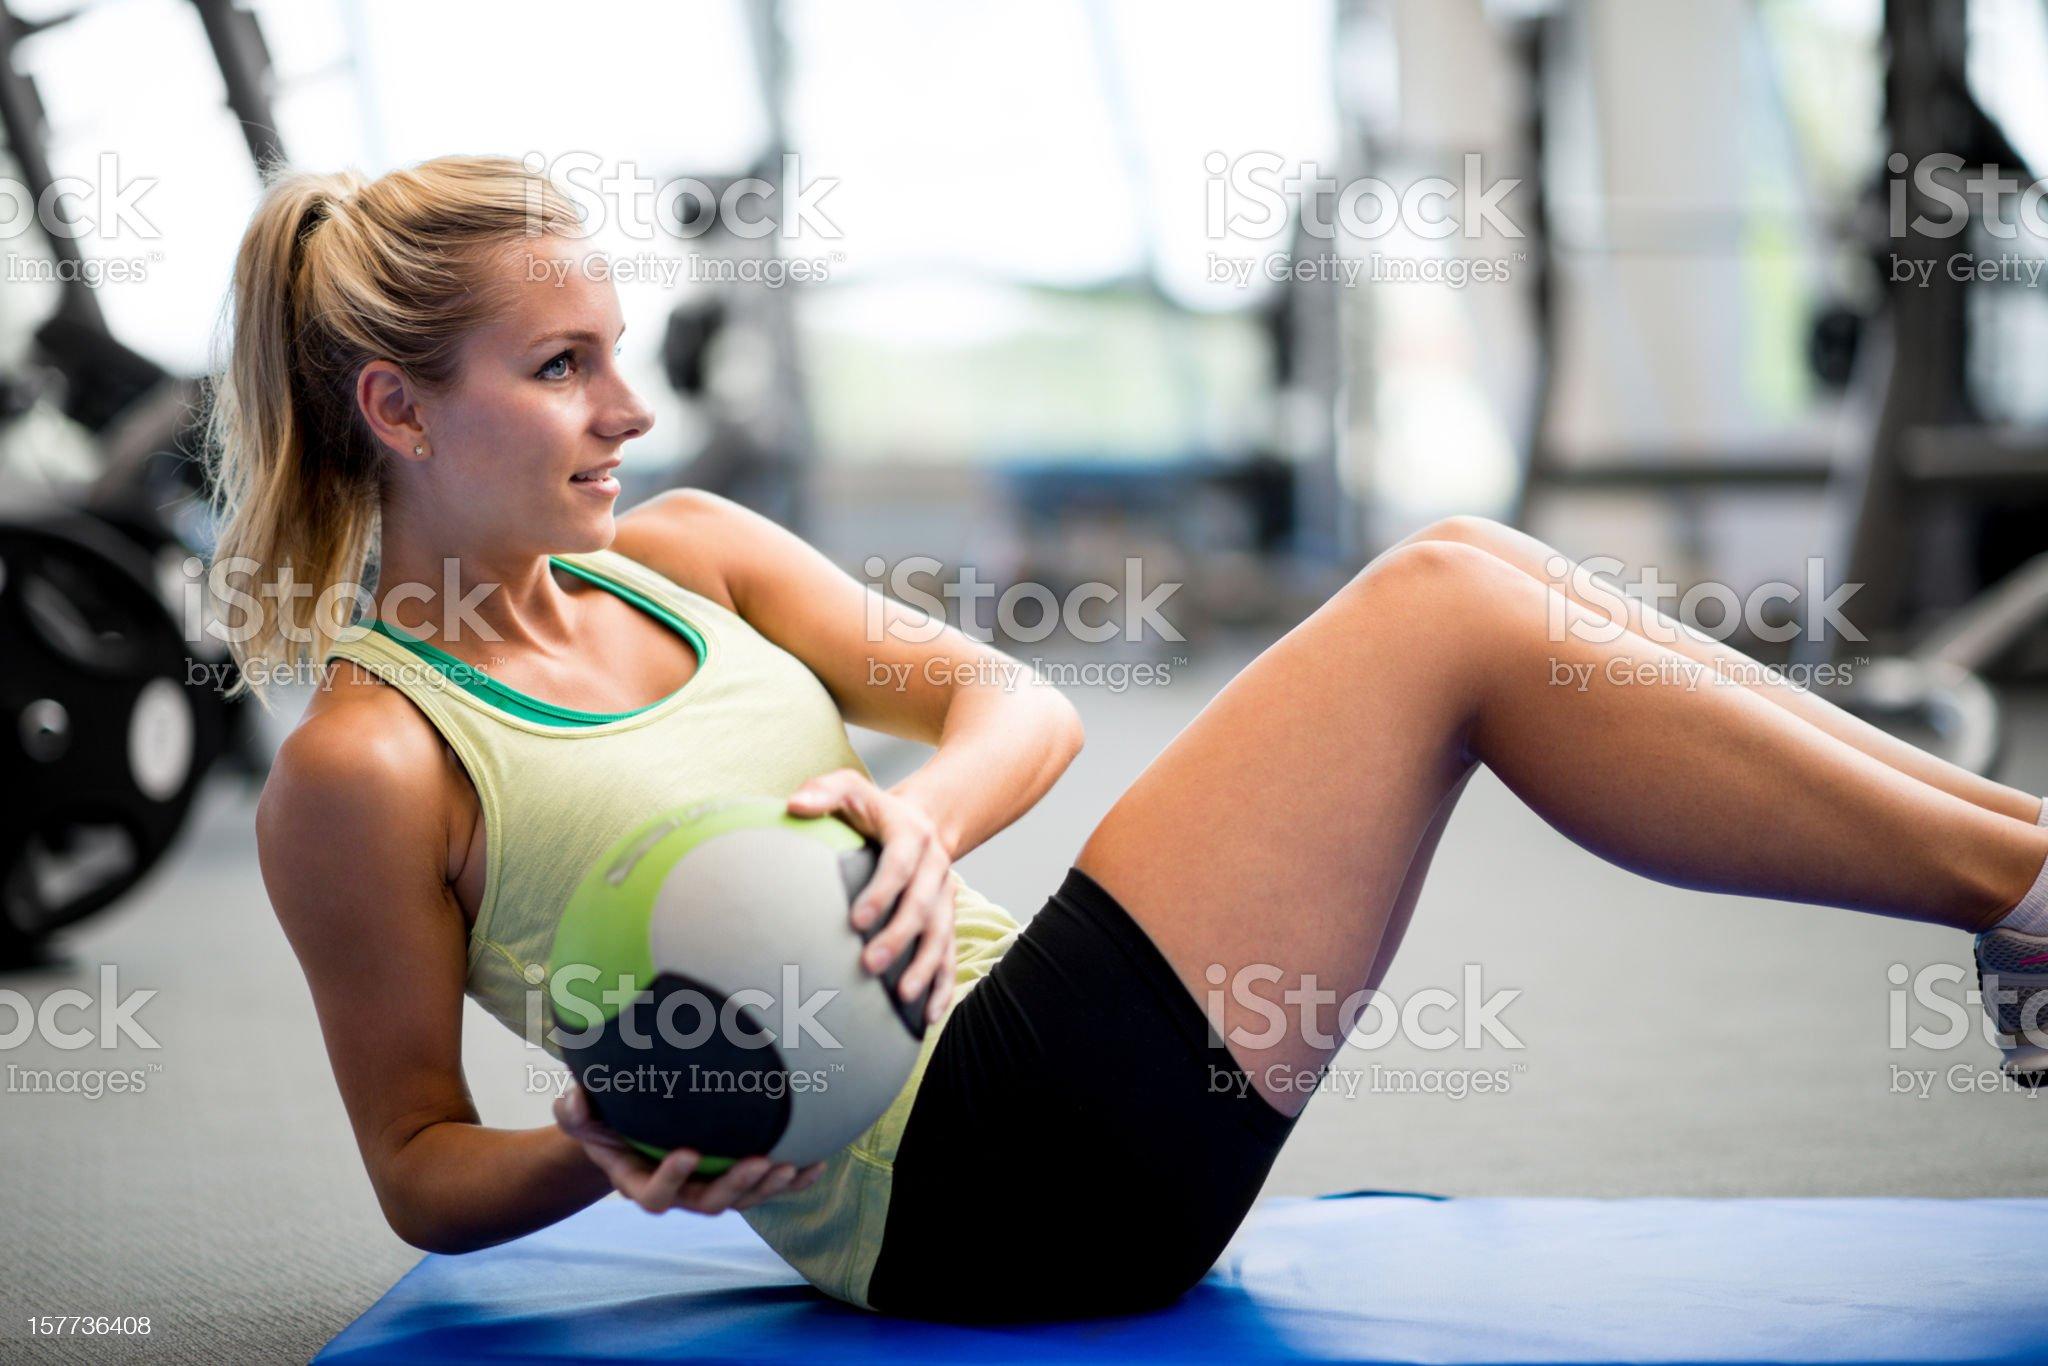 Workout royalty-free stock photo